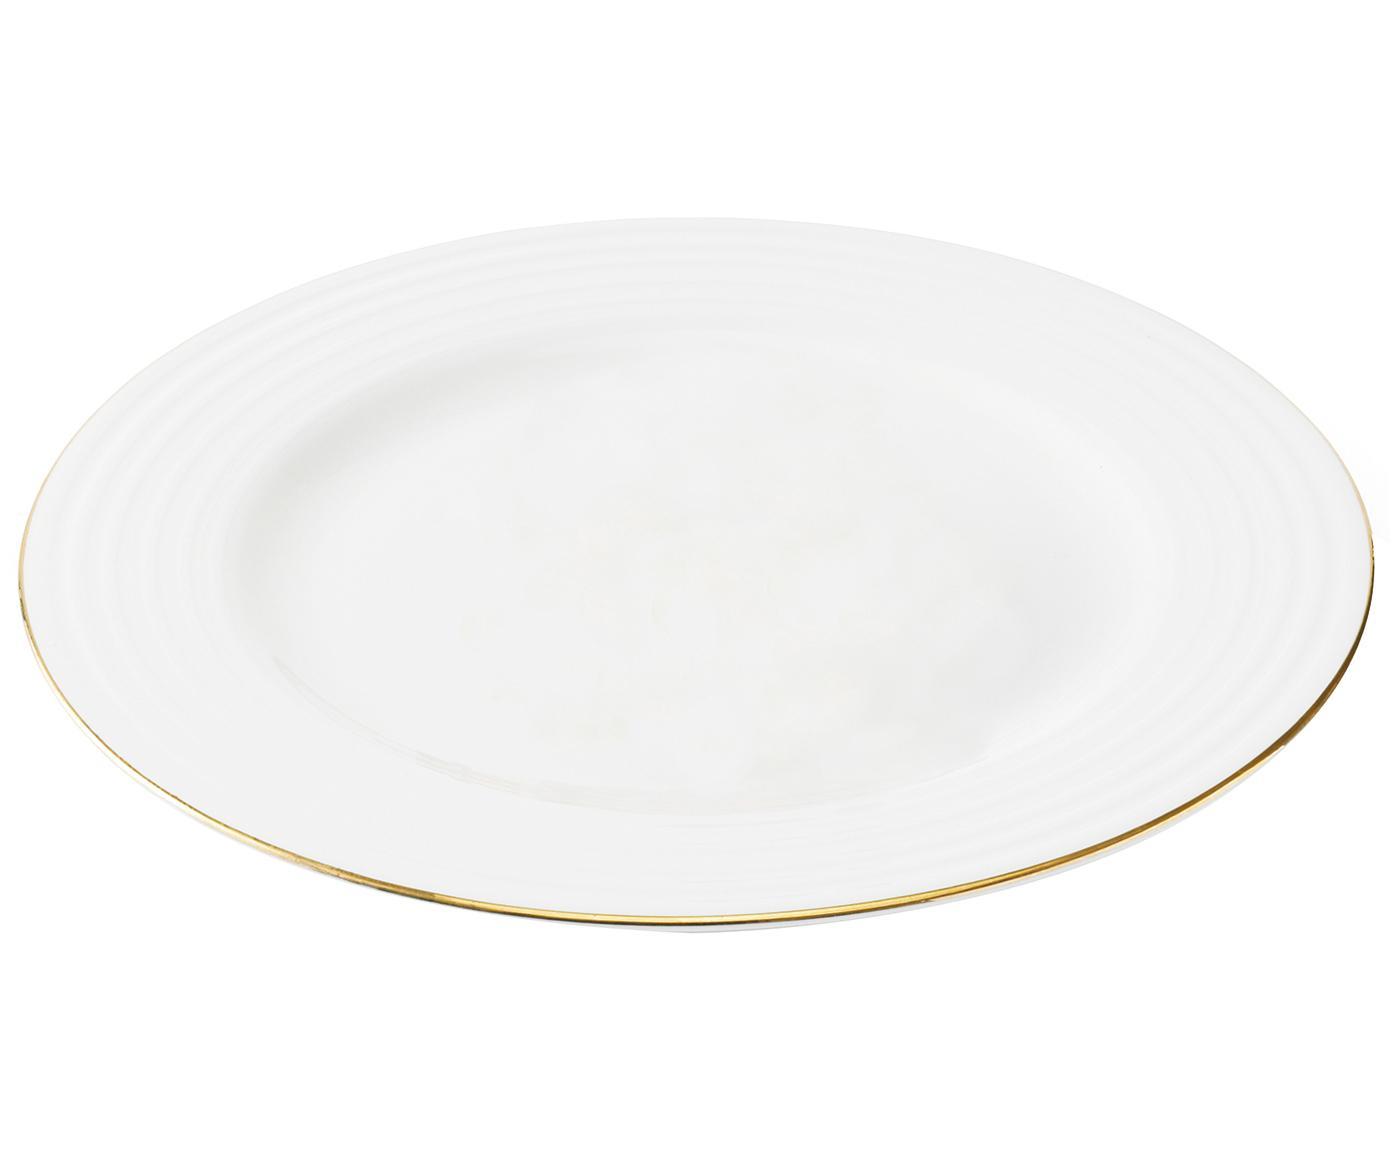 Piattino da dessert Cobald 4 pz, Porcellana, Bianco, dorato, Ø 23 cm